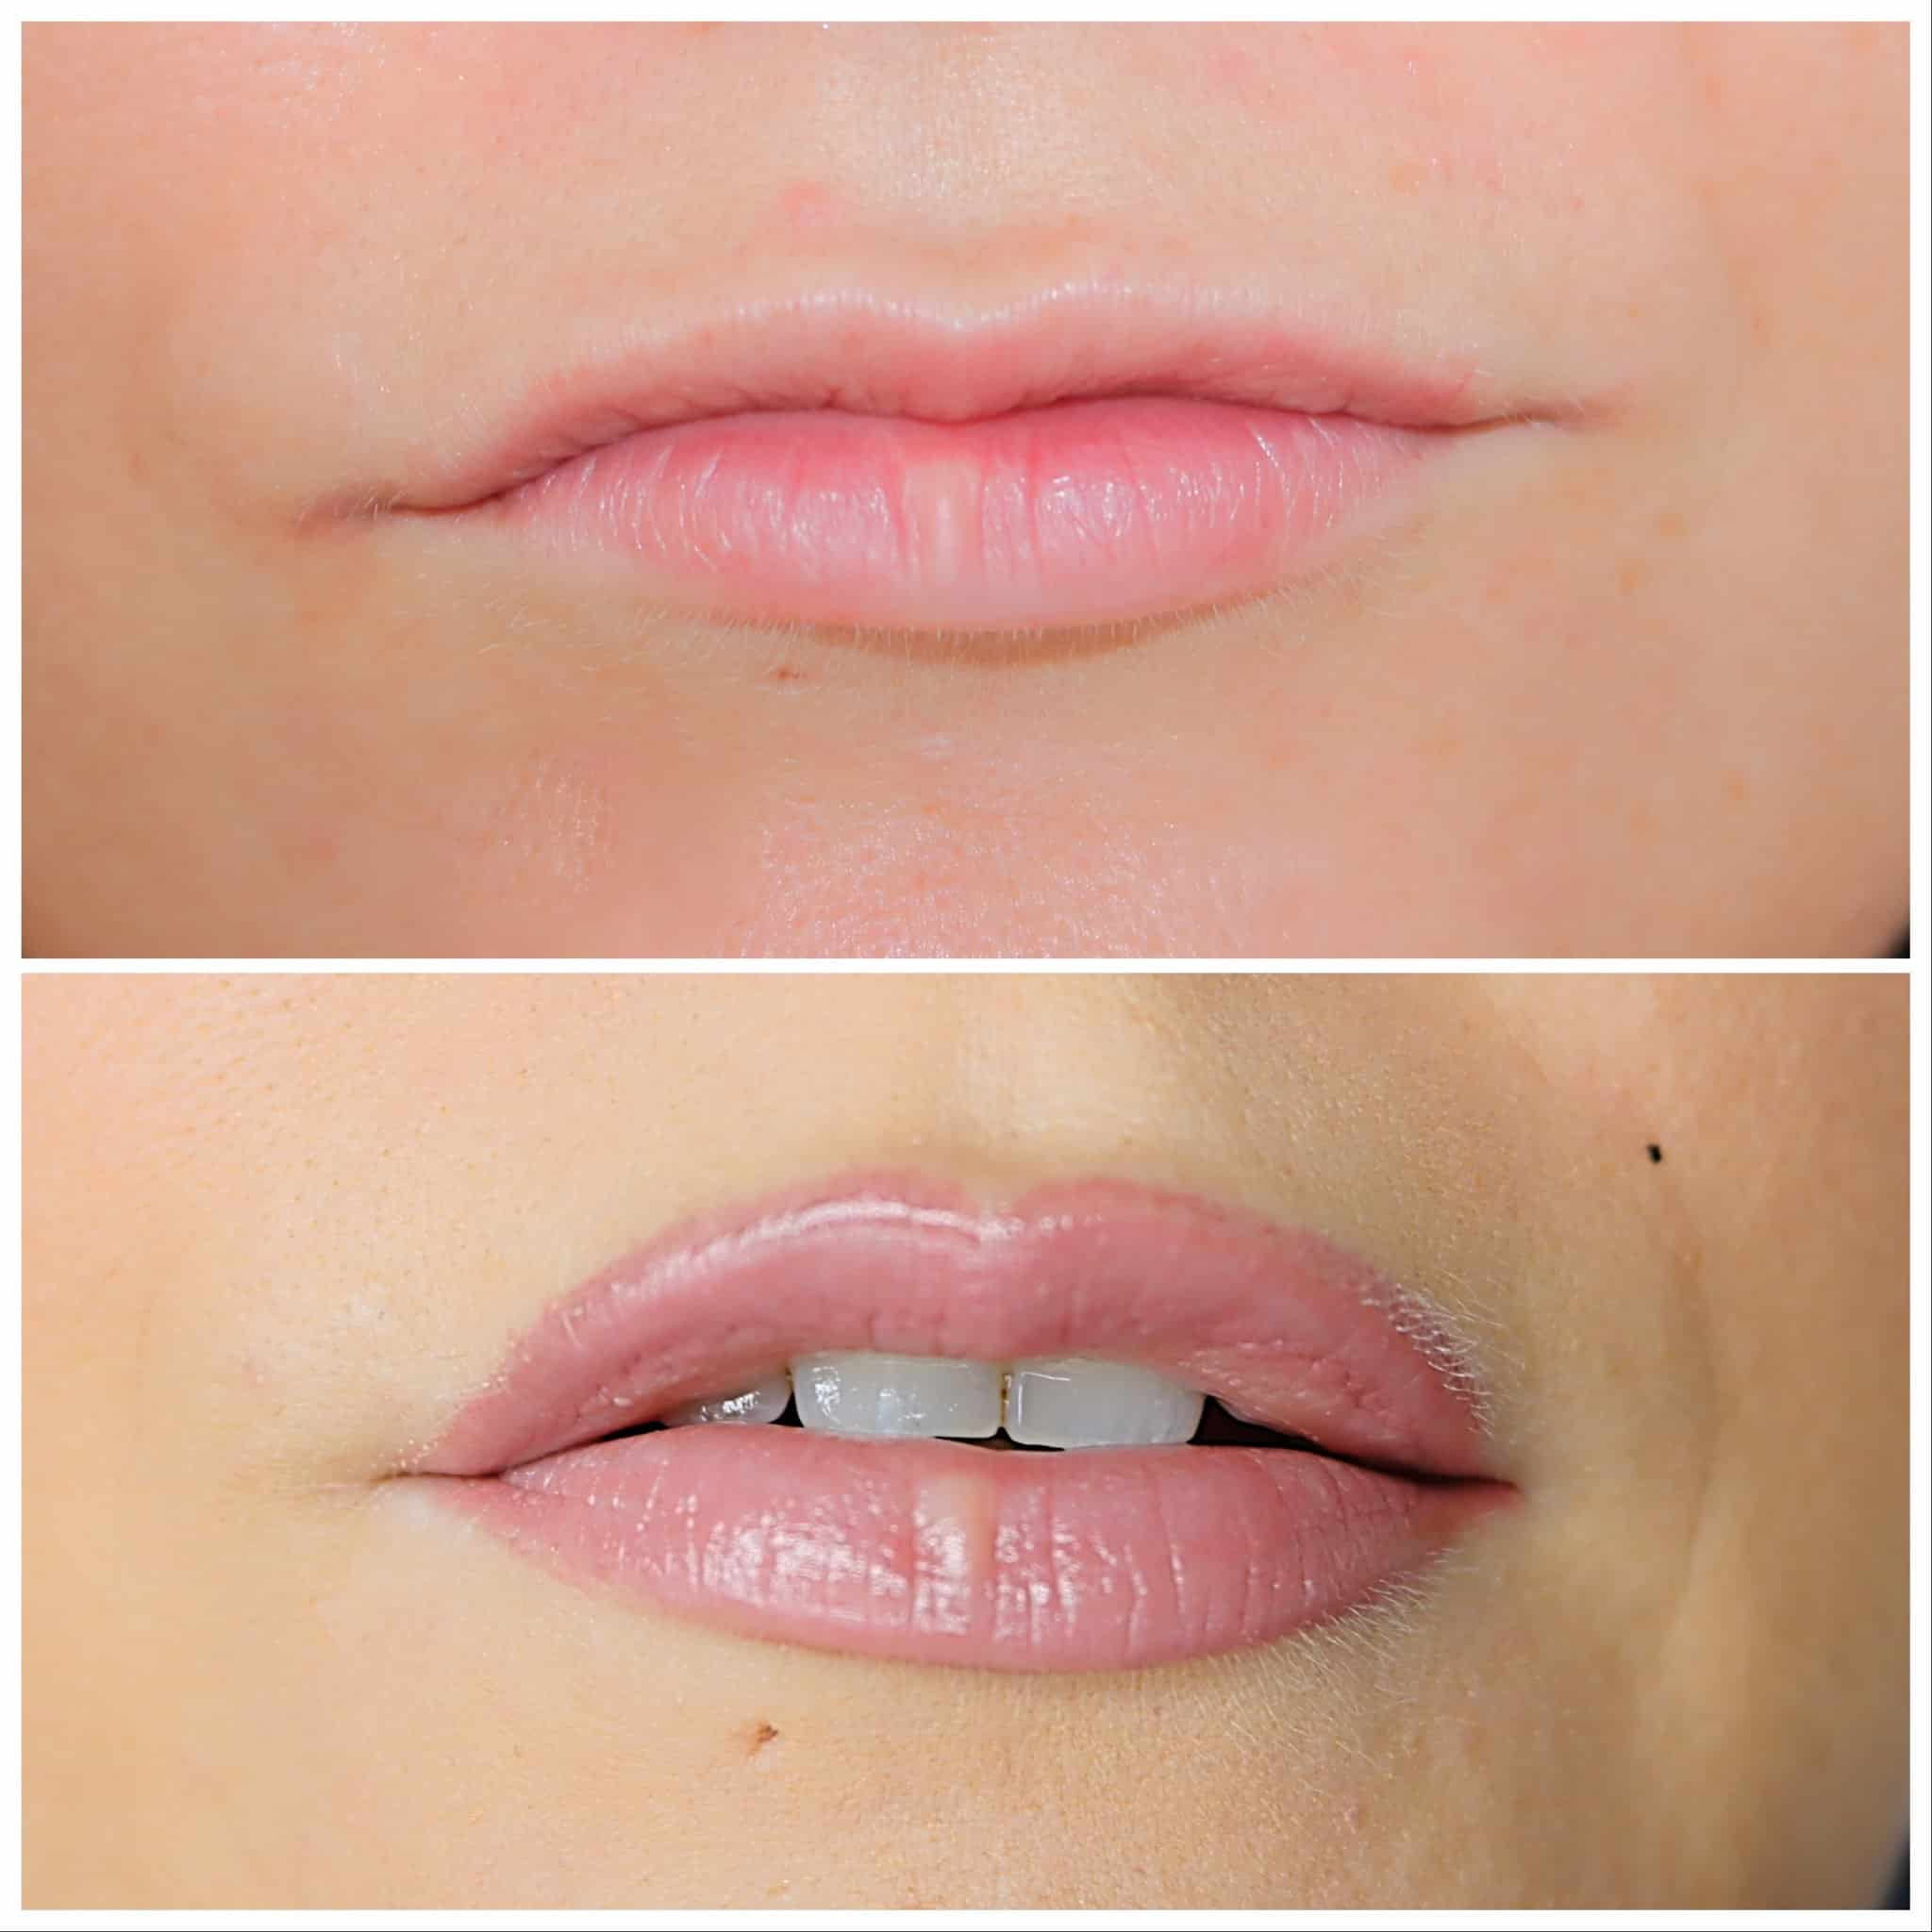 maquillage permanent montpellier levre